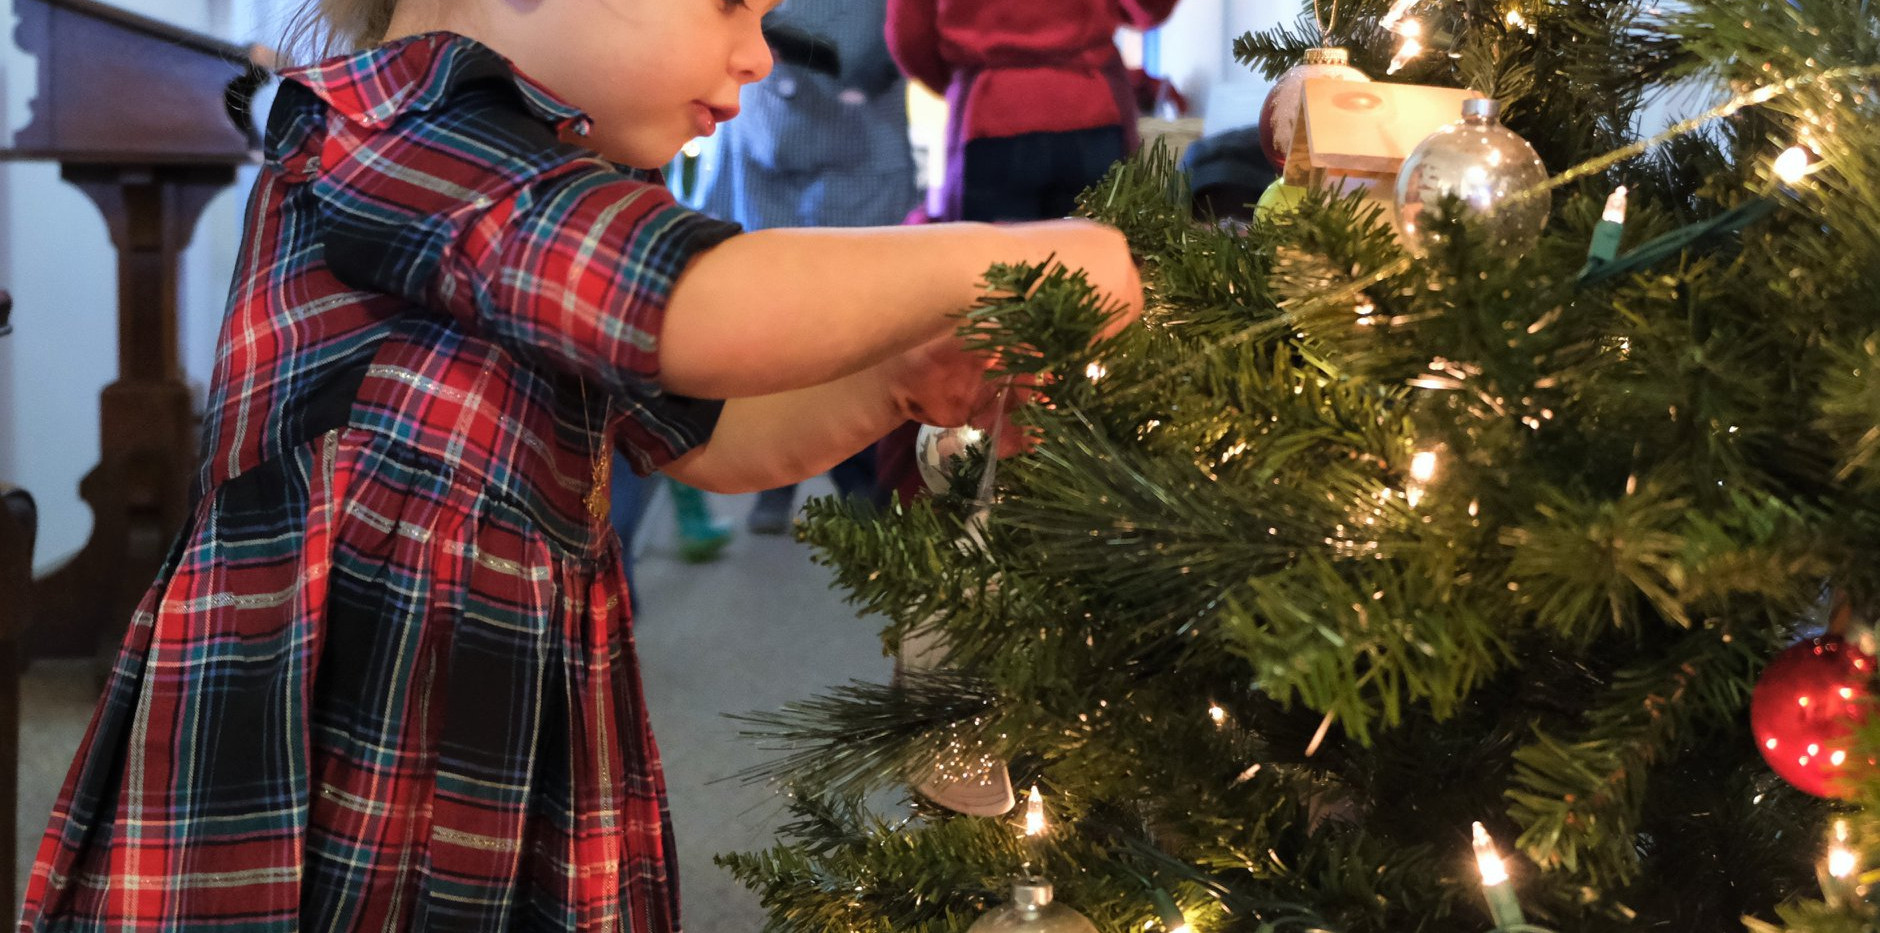 ChristmasattheBrook2019-girl_decorating_